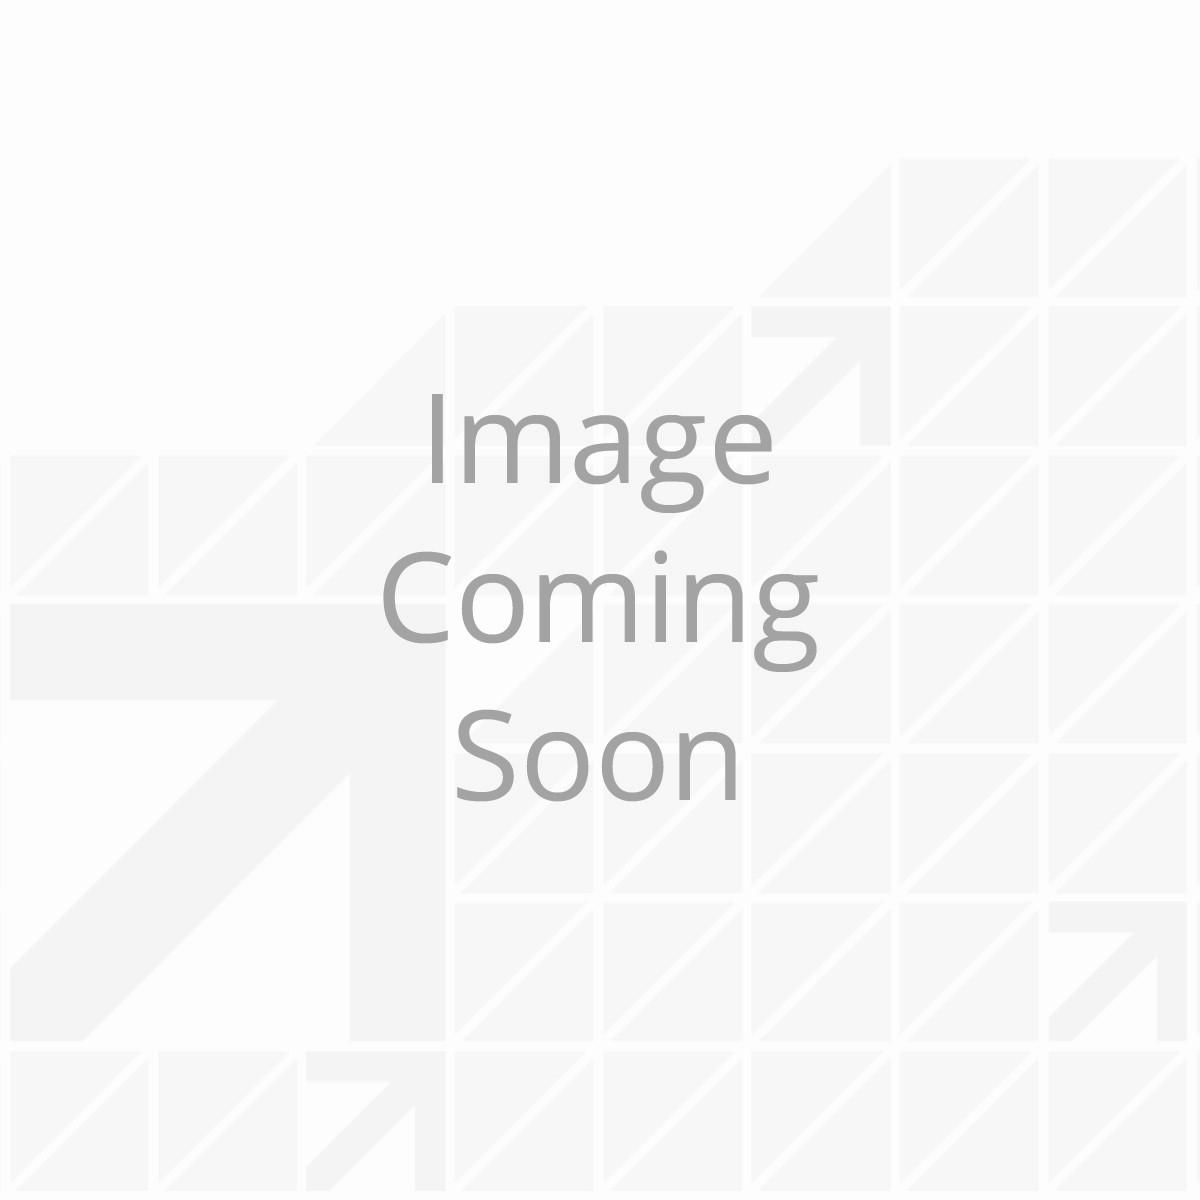 17' Power & Hybrid Awning Roller Assembly - Prepflex Black Fade